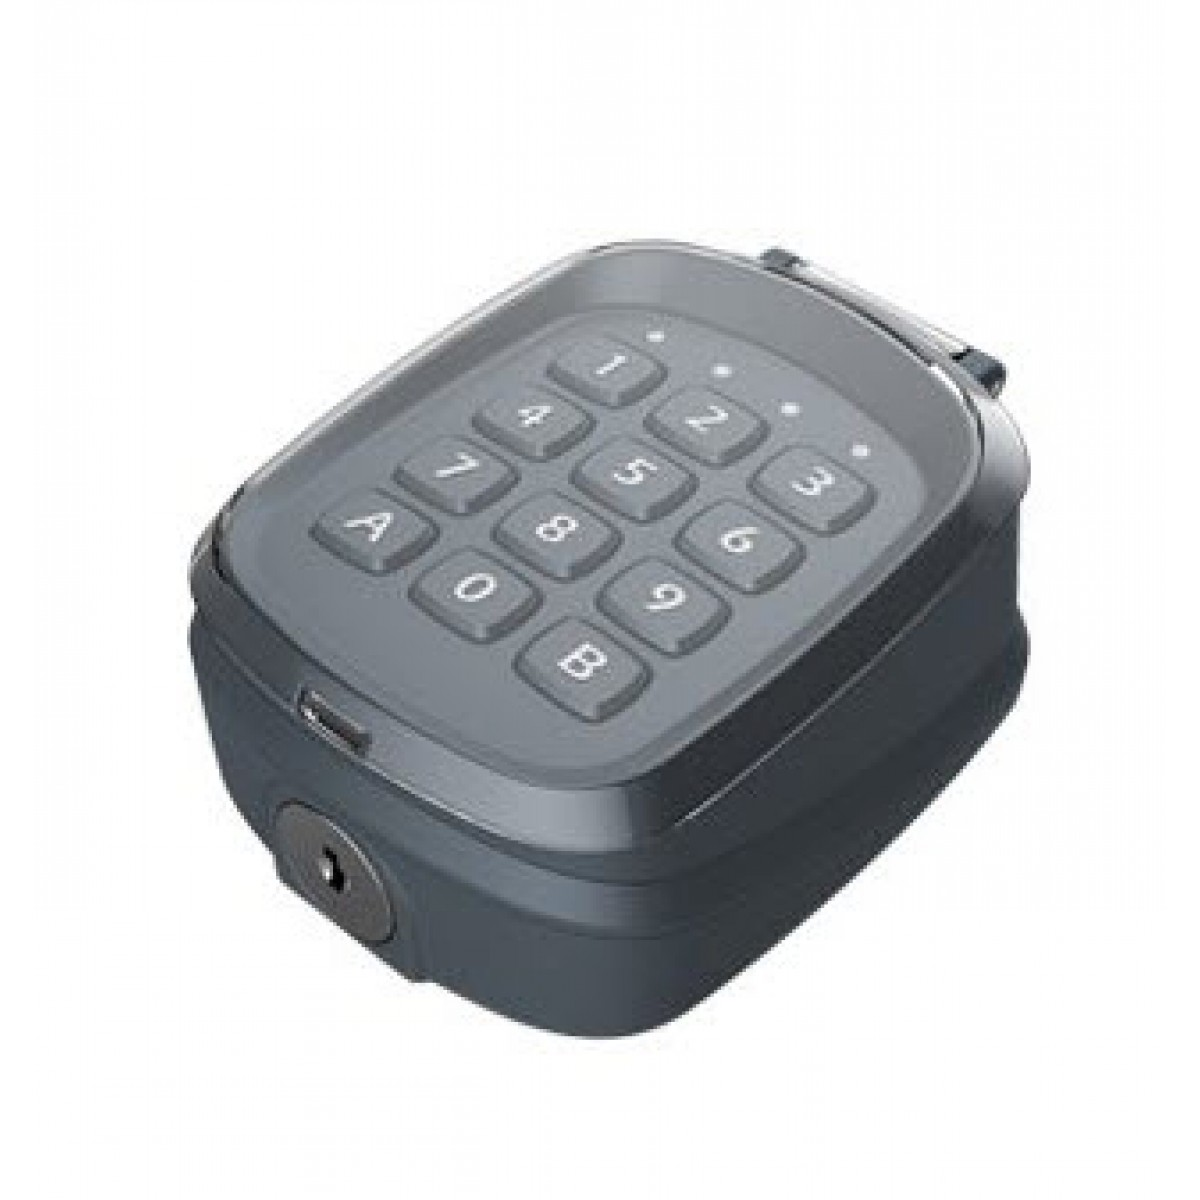 eagle wireless remote keypad tampa steel supply